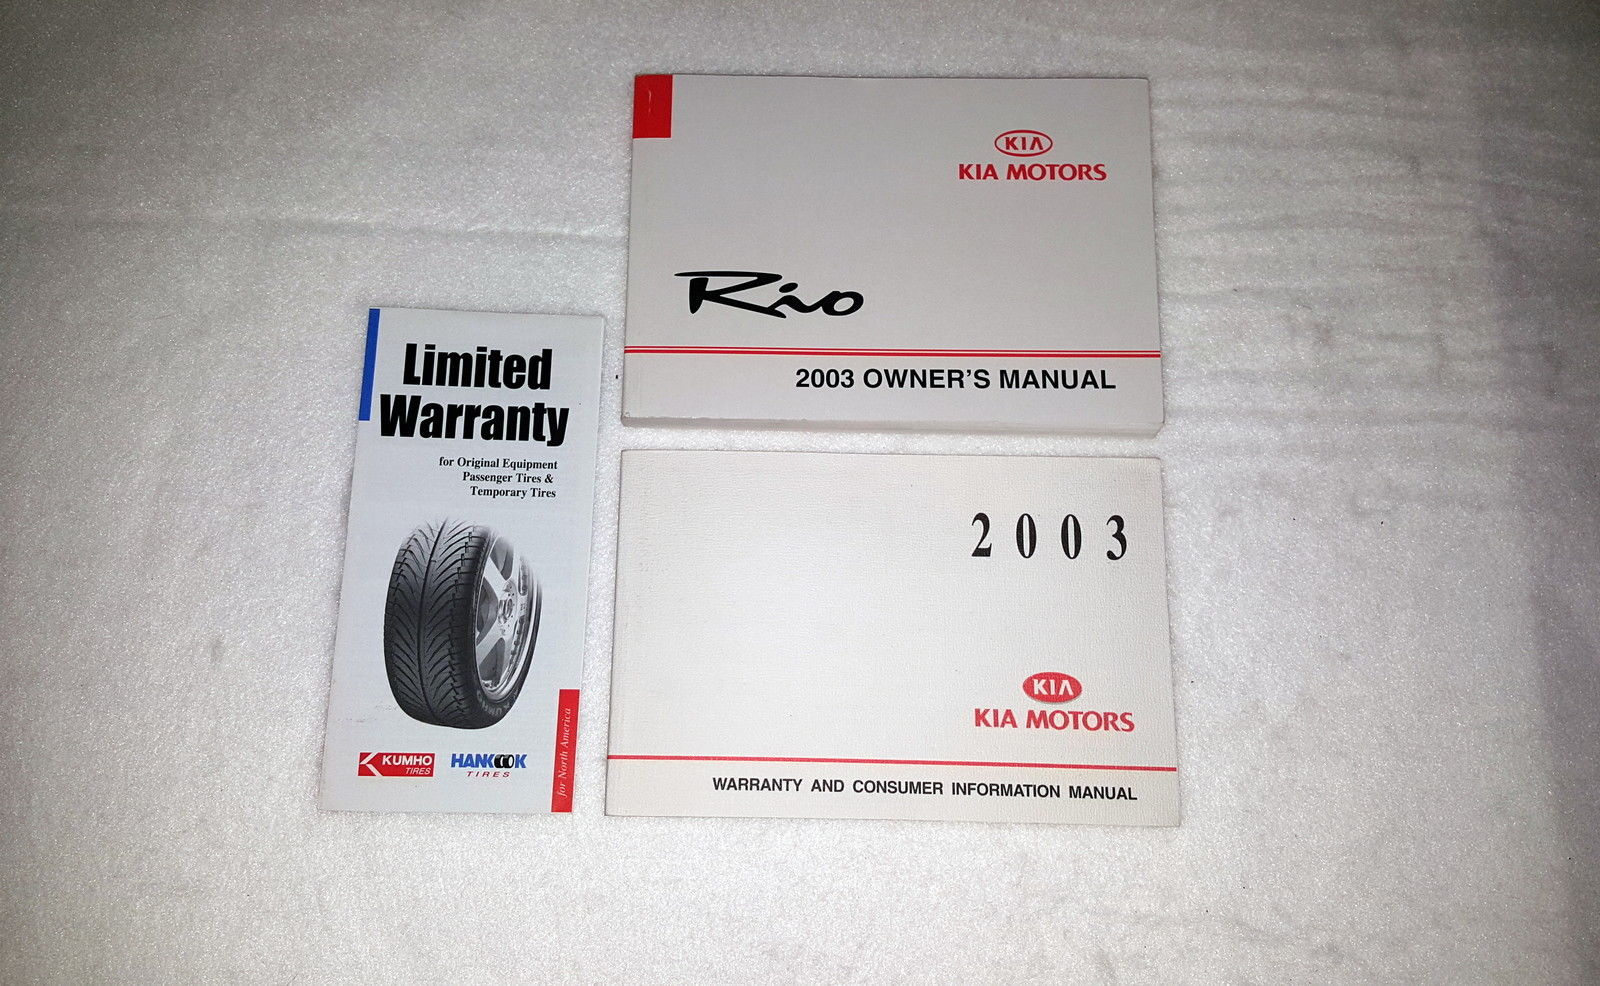 2003 Kia Rio Owners Manual 00123 - $18.76